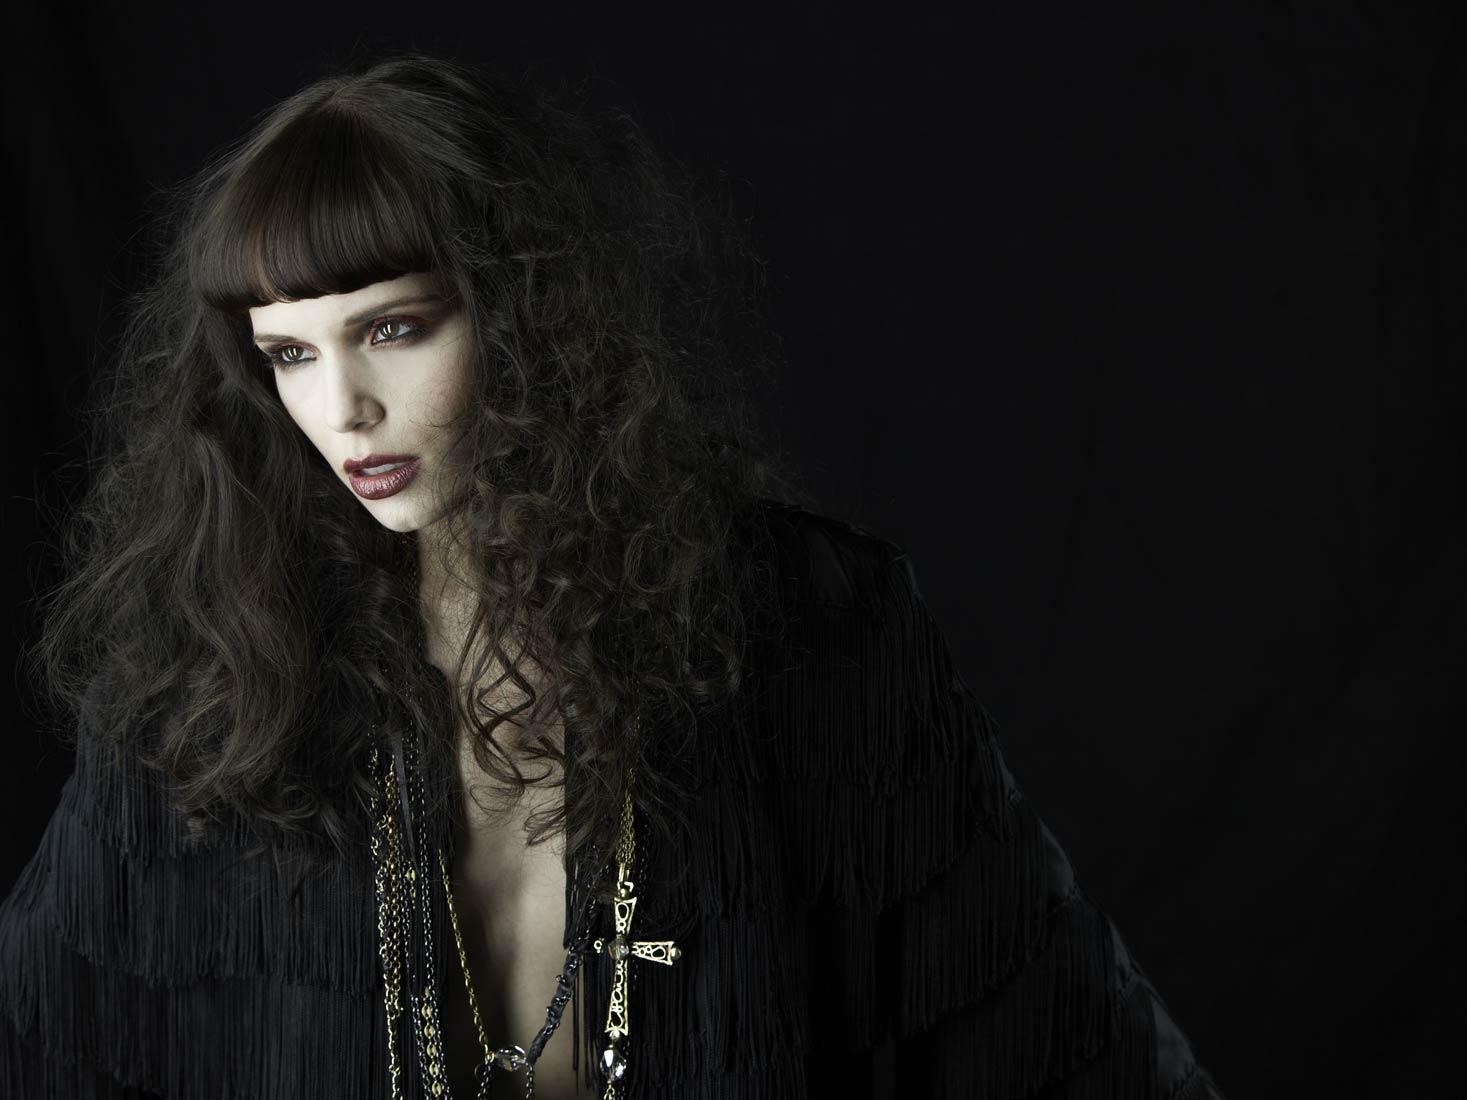 gothic edgy fashion model